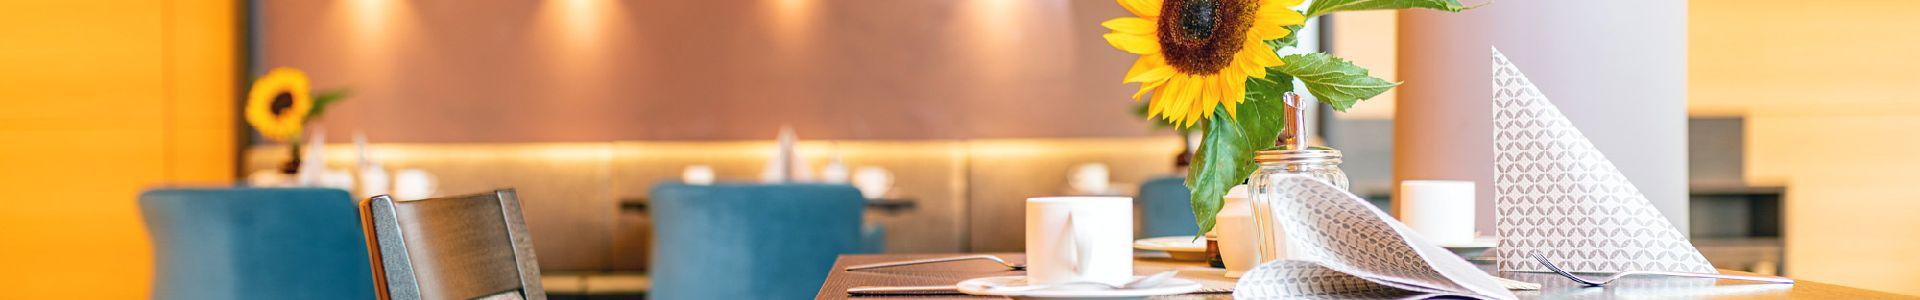 Café-Restaurant Badstube